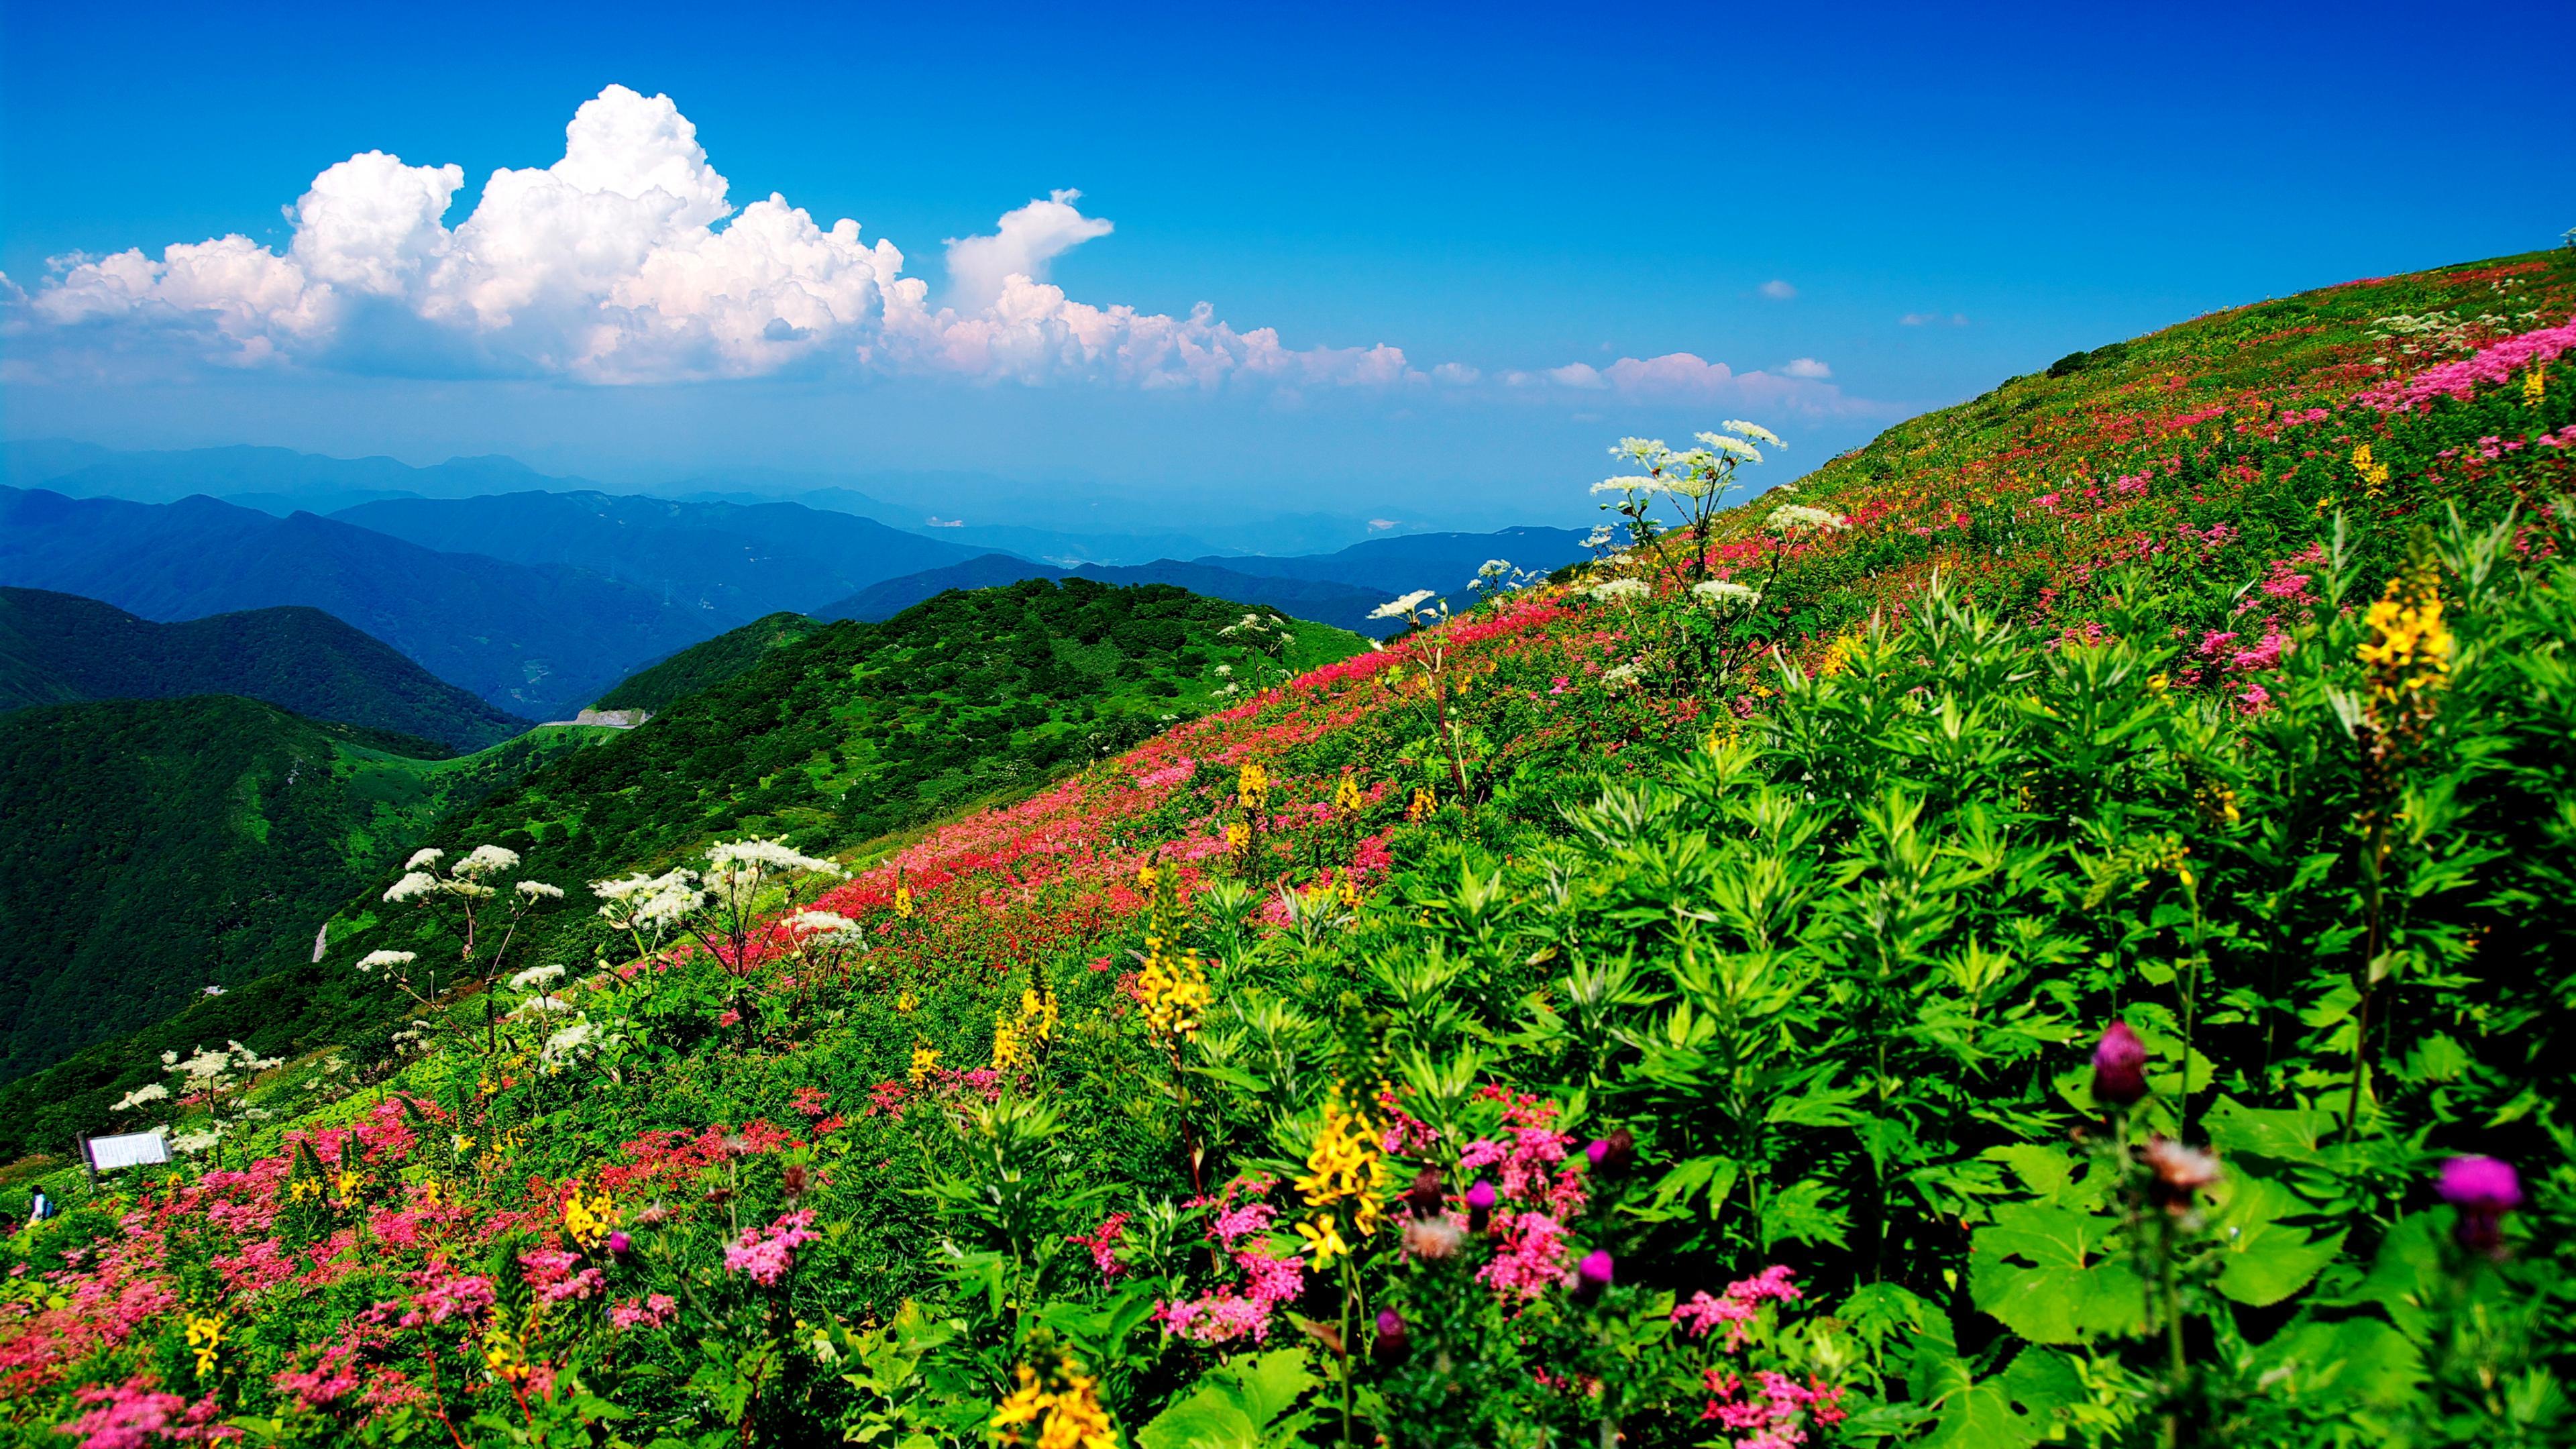 Flowers On The Mountainside 4k Ultra Hd Duvar Kağıdı Arka Plan